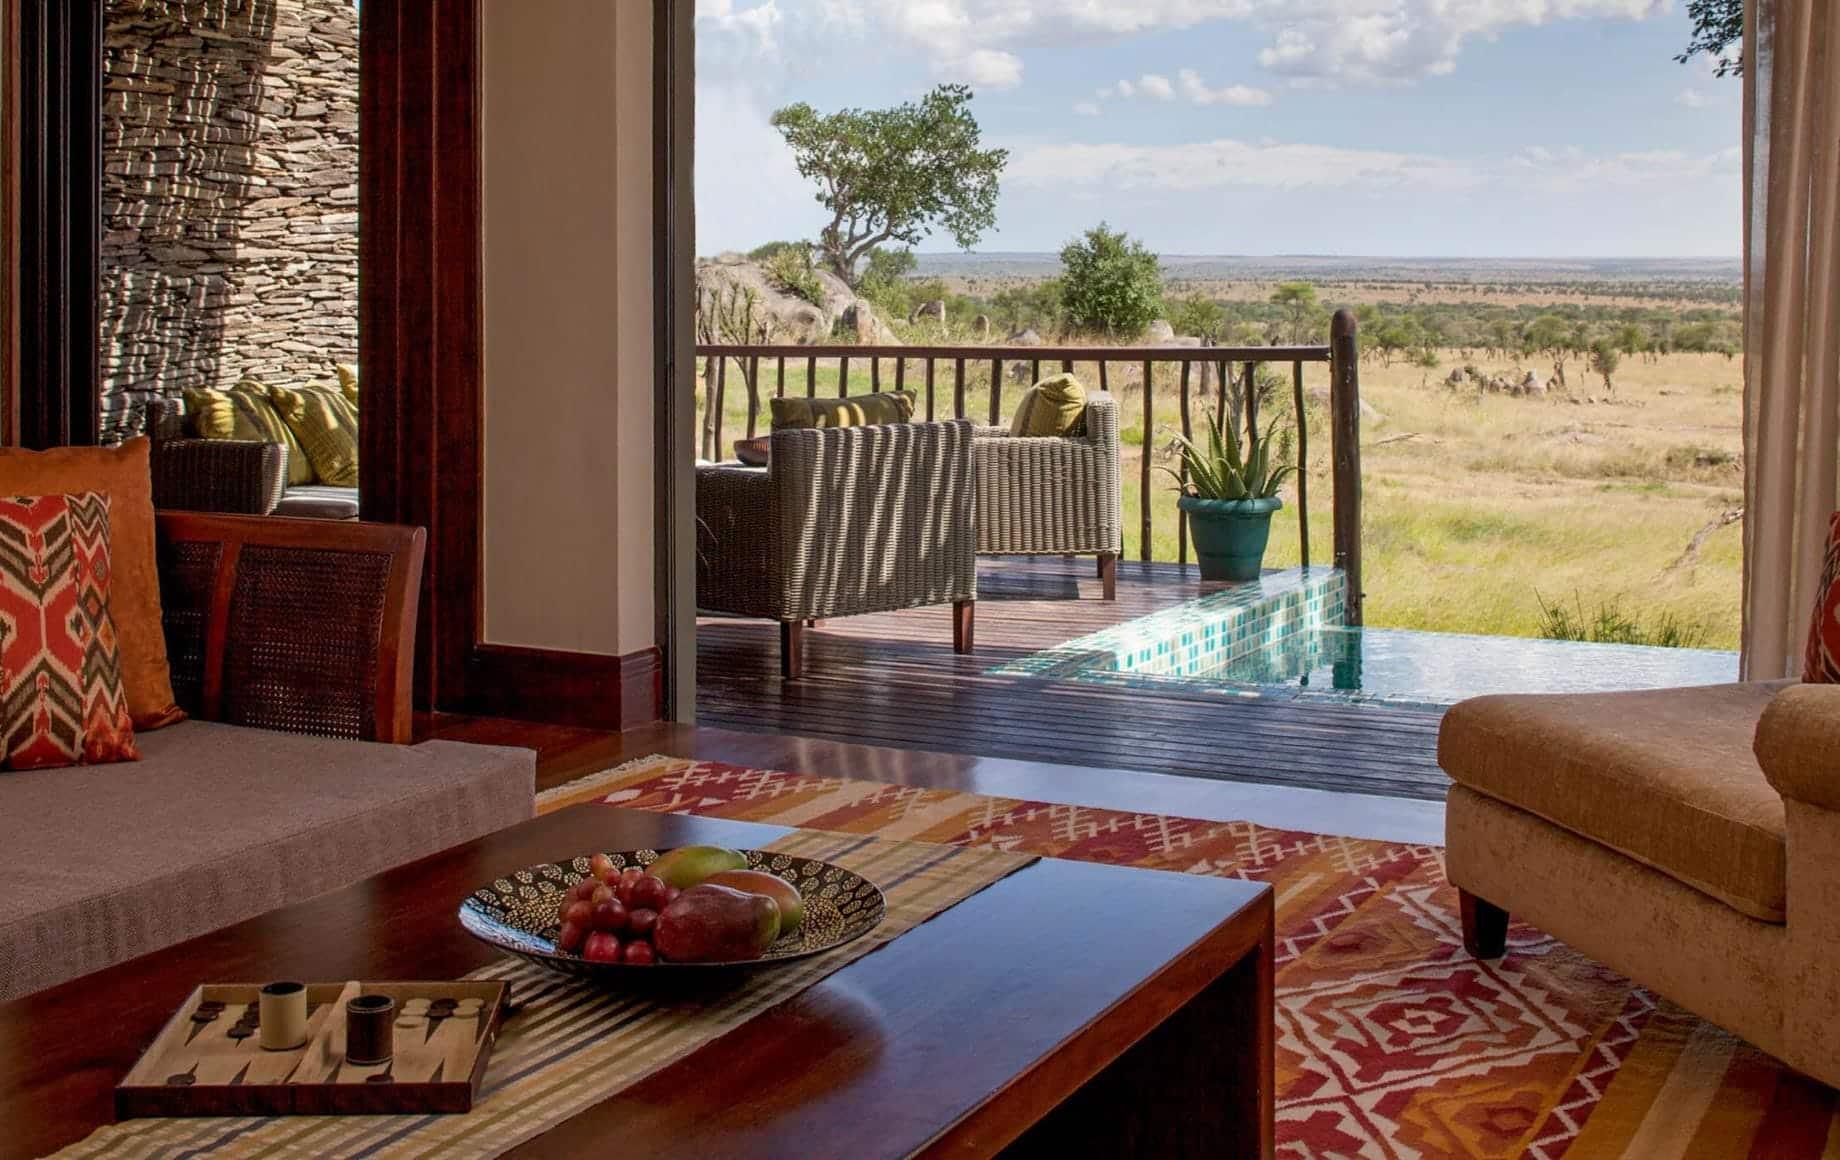 Four Seasons Safari Lodge Serengeti interior